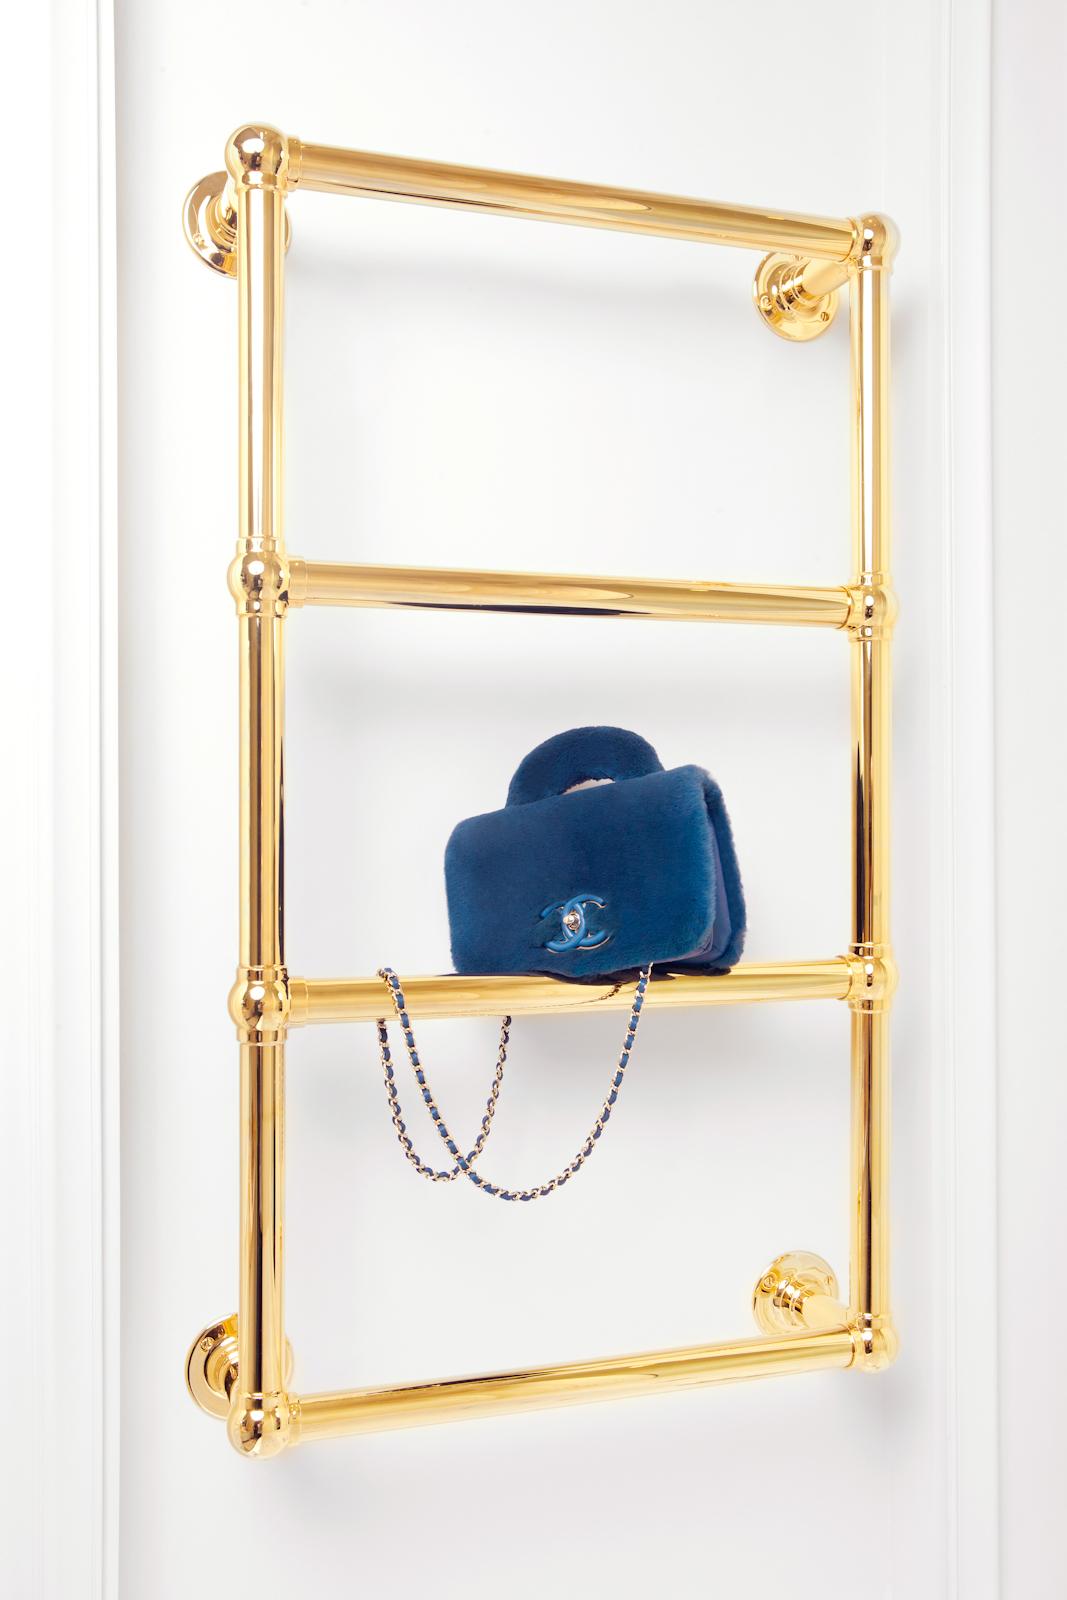 Carton Mag x Chanel_Valentin Fougeray